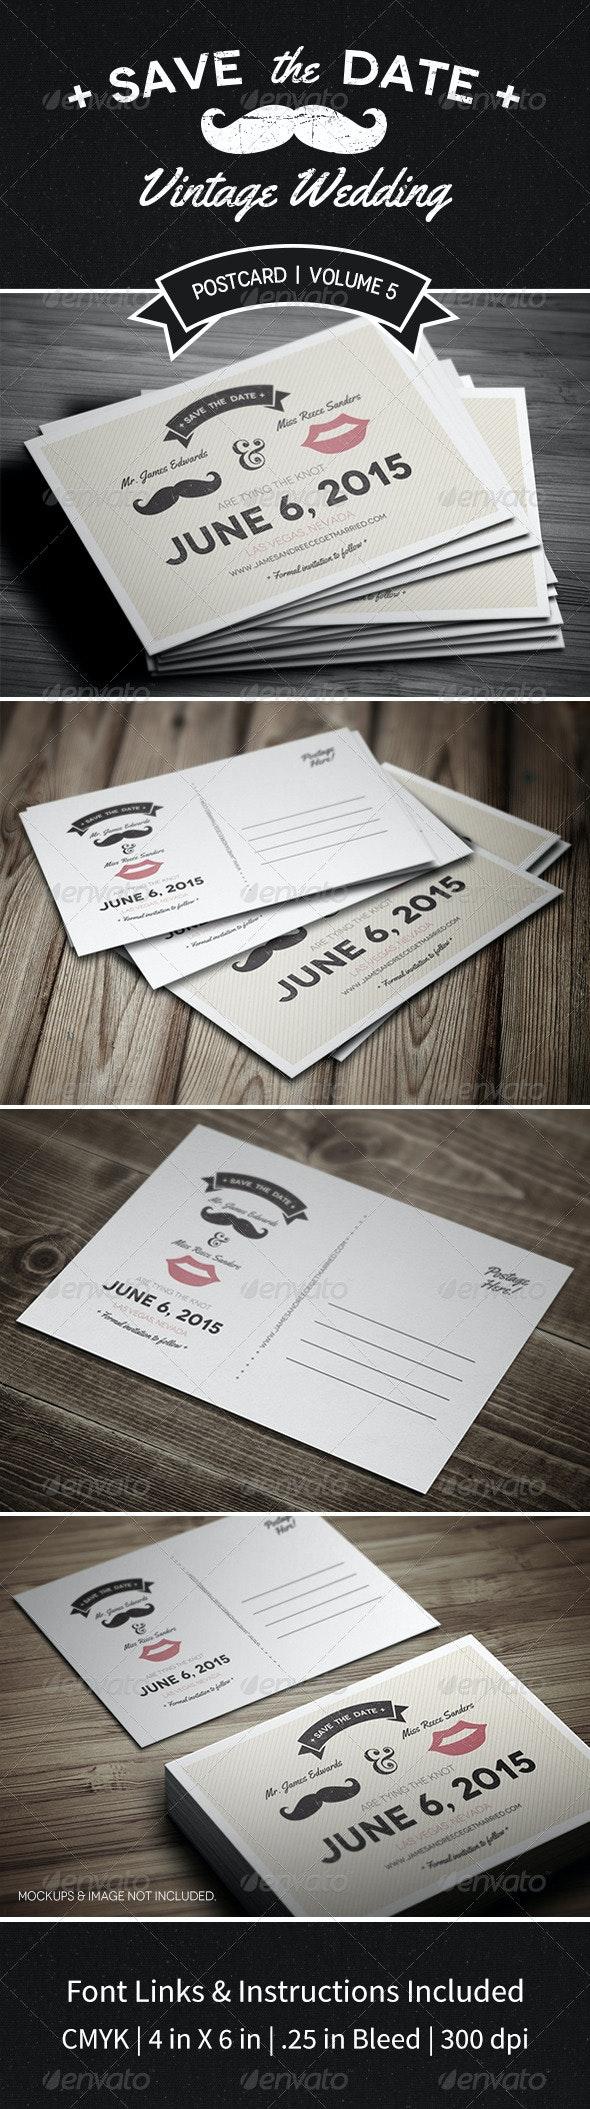 Save The Date Postcard | Volume 5 - Weddings Cards & Invites